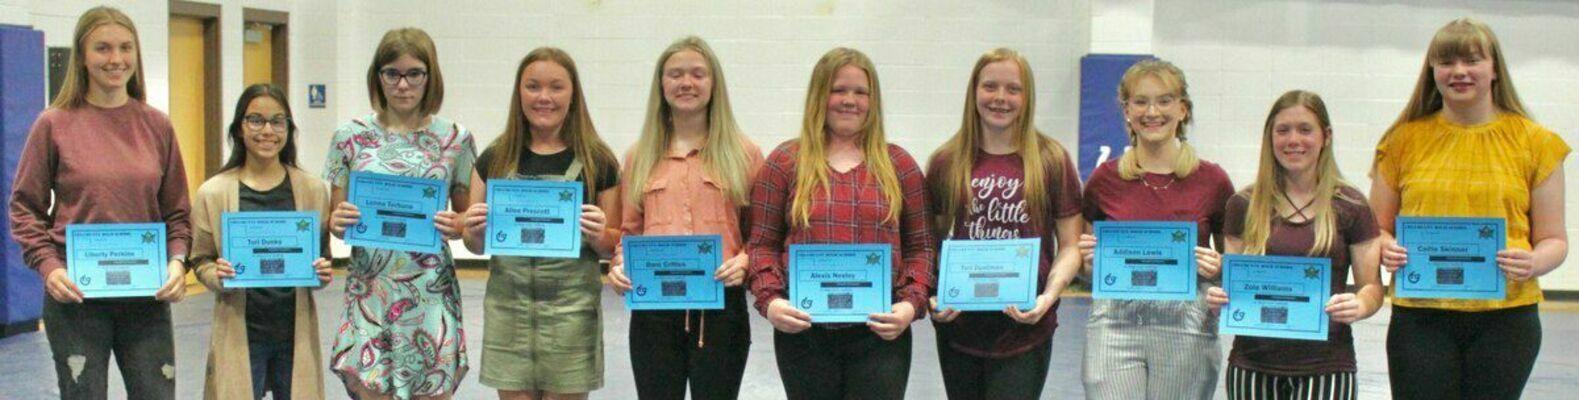 Junior High Softball - from left; Liberty Perkins, Tori Dunks, Lonna Terhune, Allee Prescott, Dani Critten, Alexis Neeley, Tori Dustman, Addison Lewis, Zoie Williams and Callie Skinner.